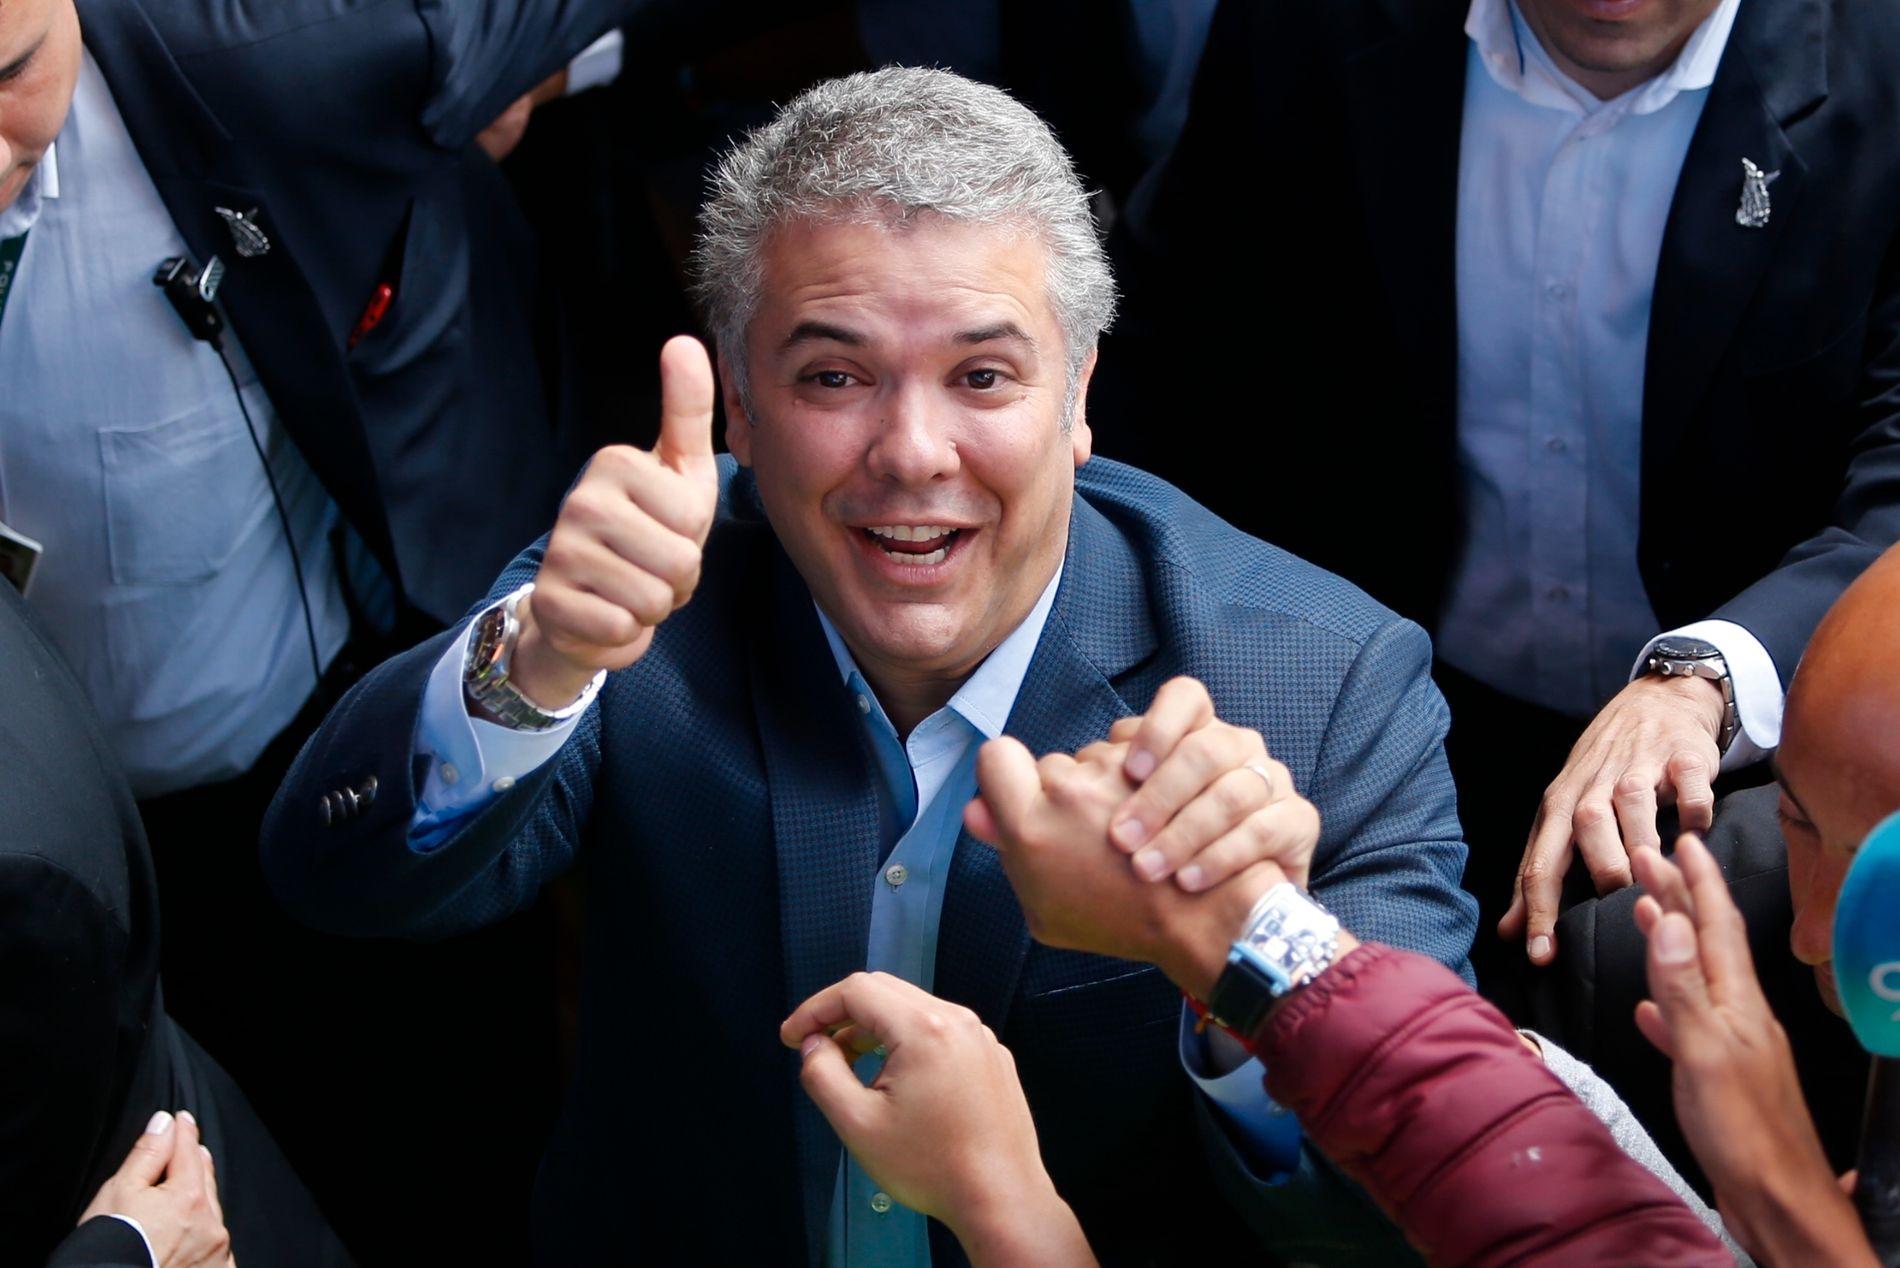 VINNER: Den konservative Ivan Duque vant presidentvalget i Colombia søndag.